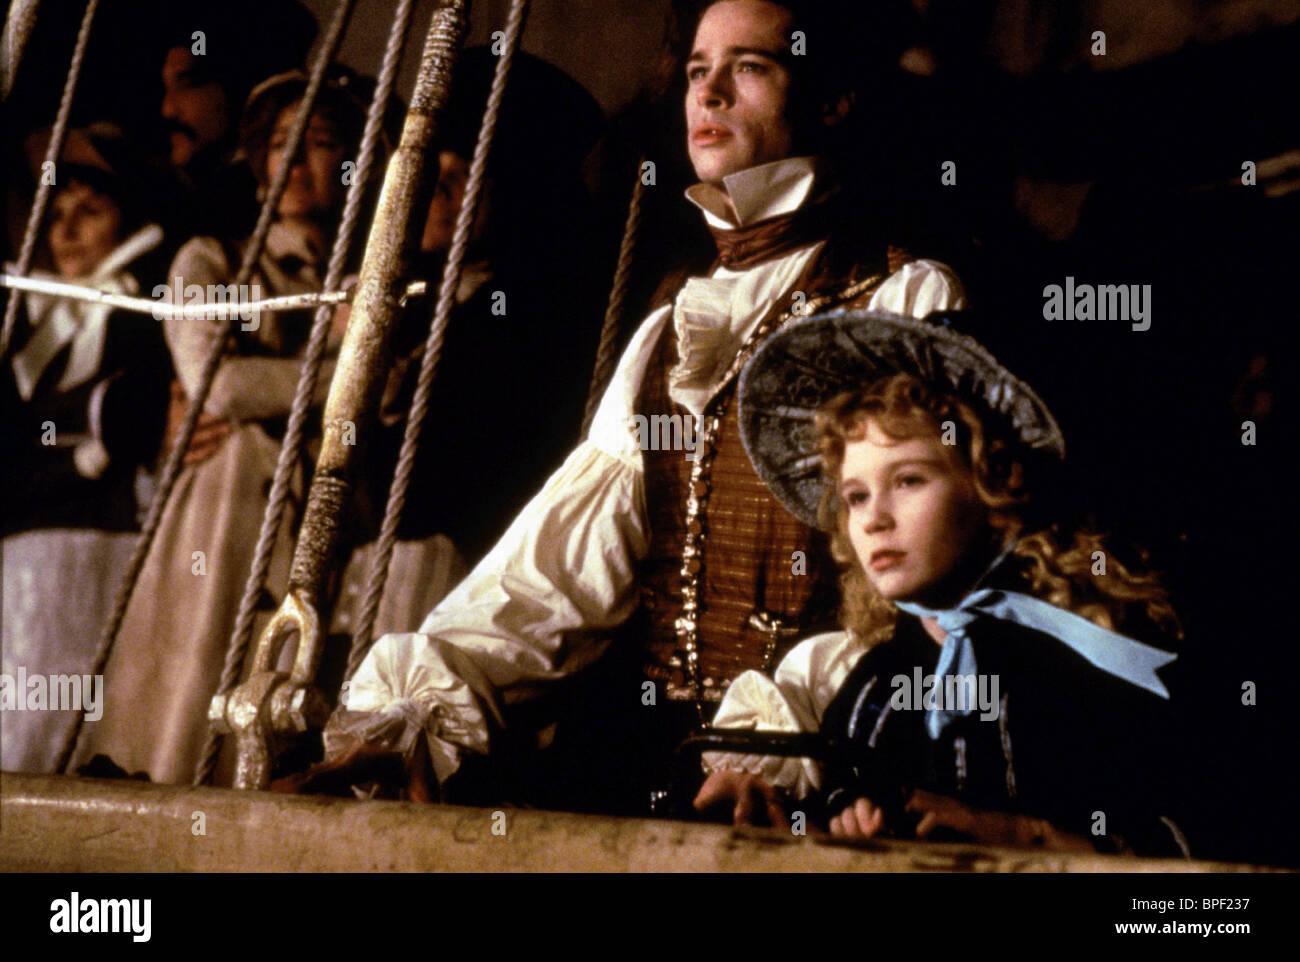 Brad Pitt Kirsten Dunst Interview With The Vampire The Vampire Stock Photo Alamy